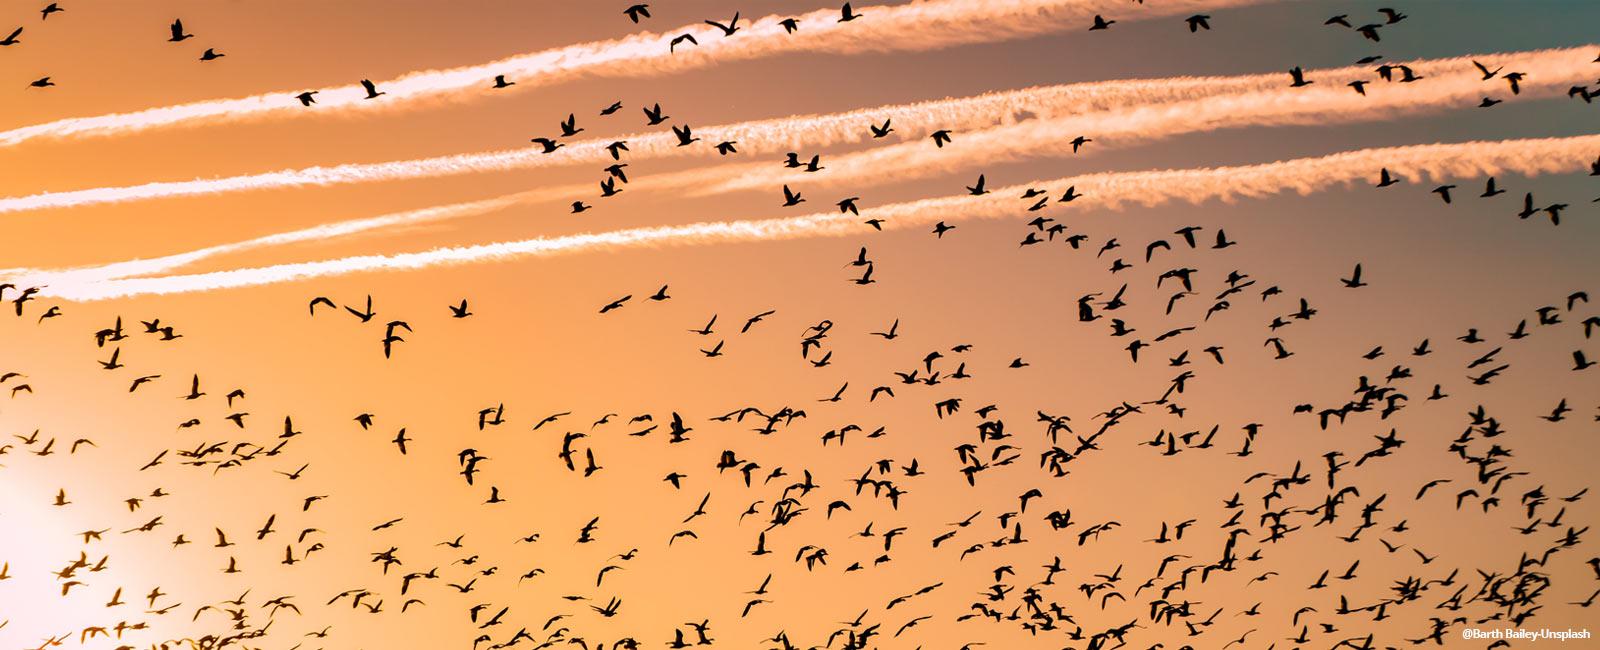 Migratory Birds: The Phenomenal Global Citizens